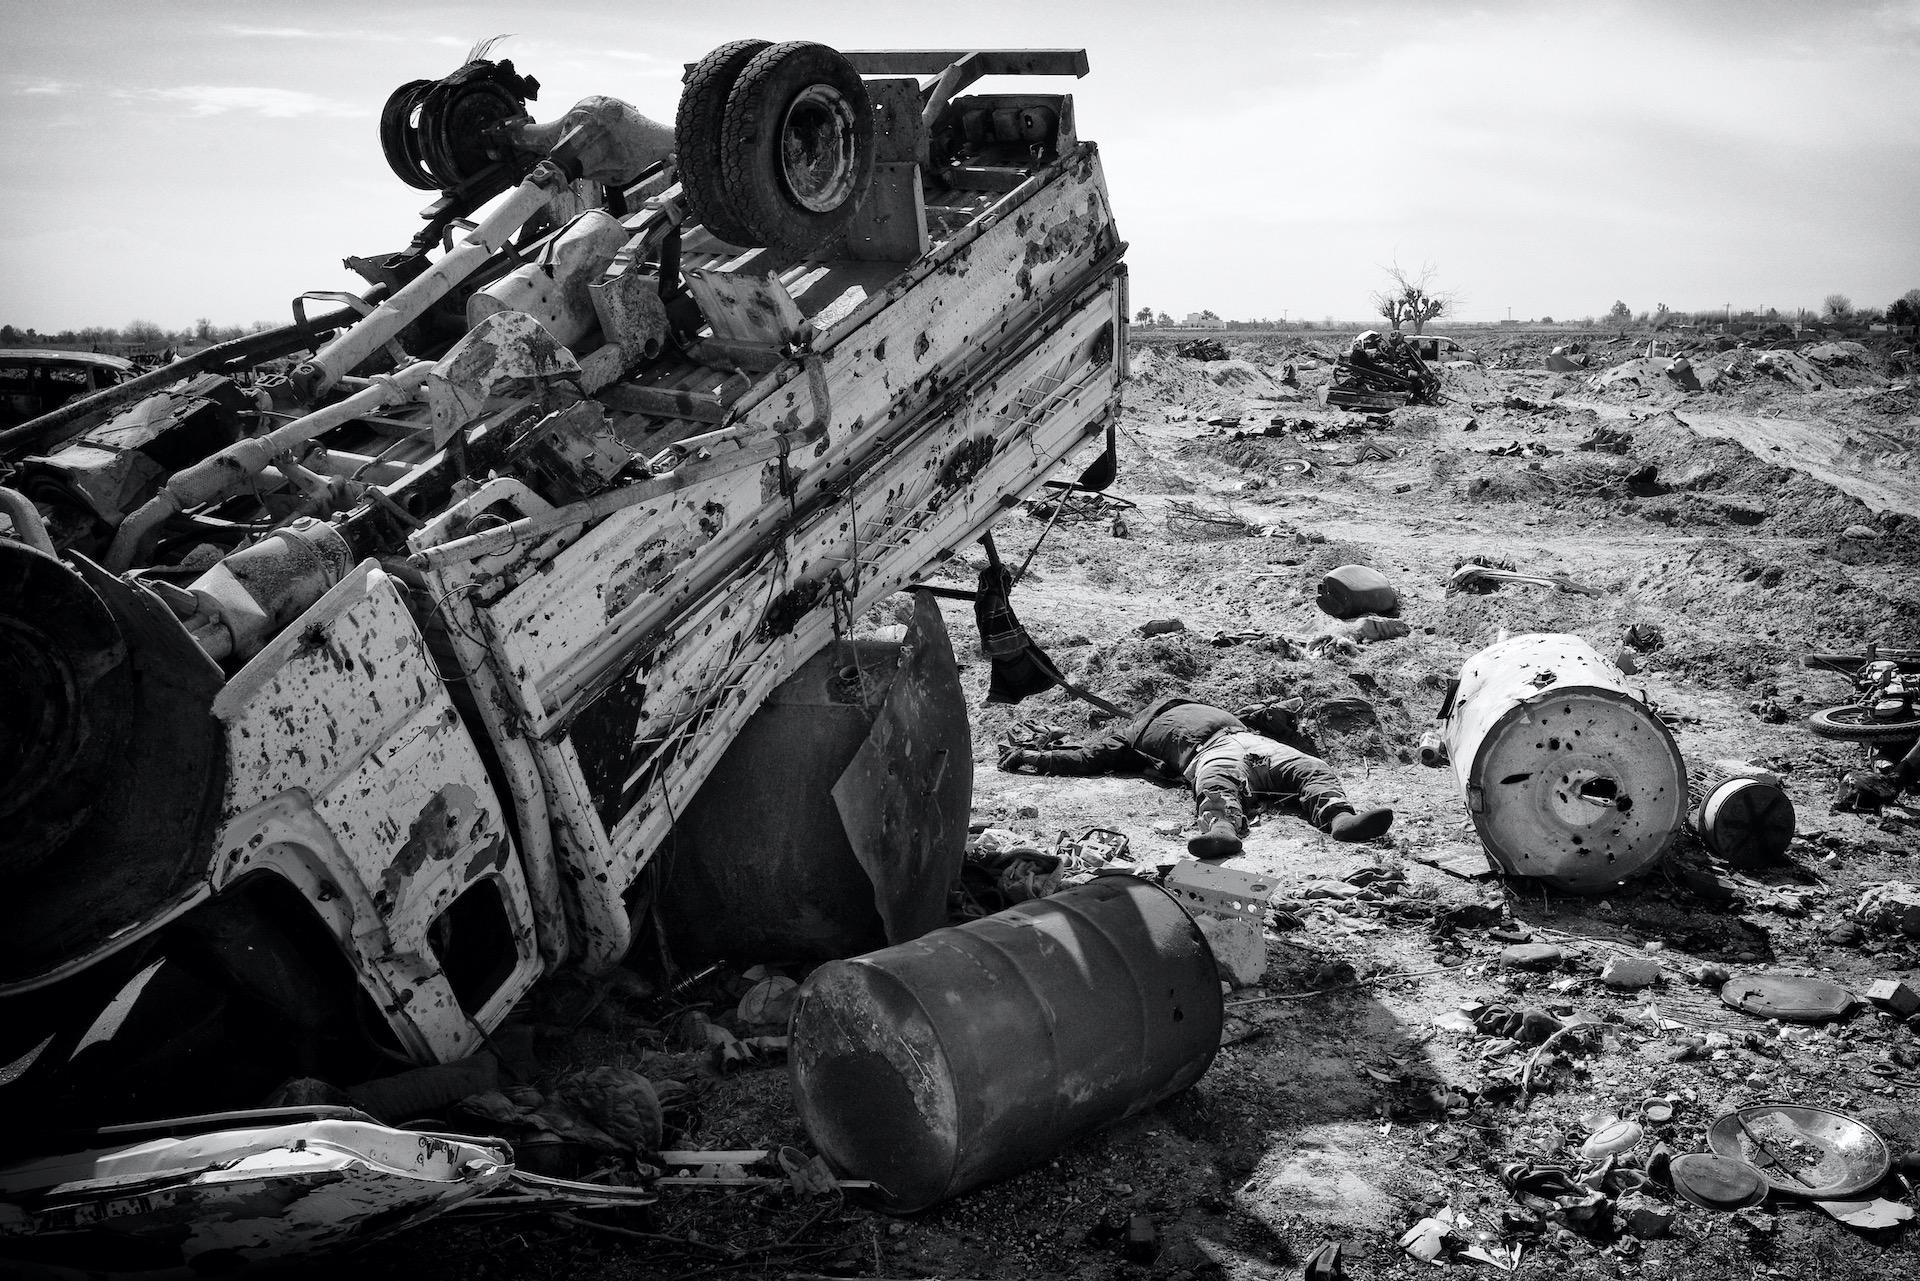 Syria baghuz, ISIS last Bastion